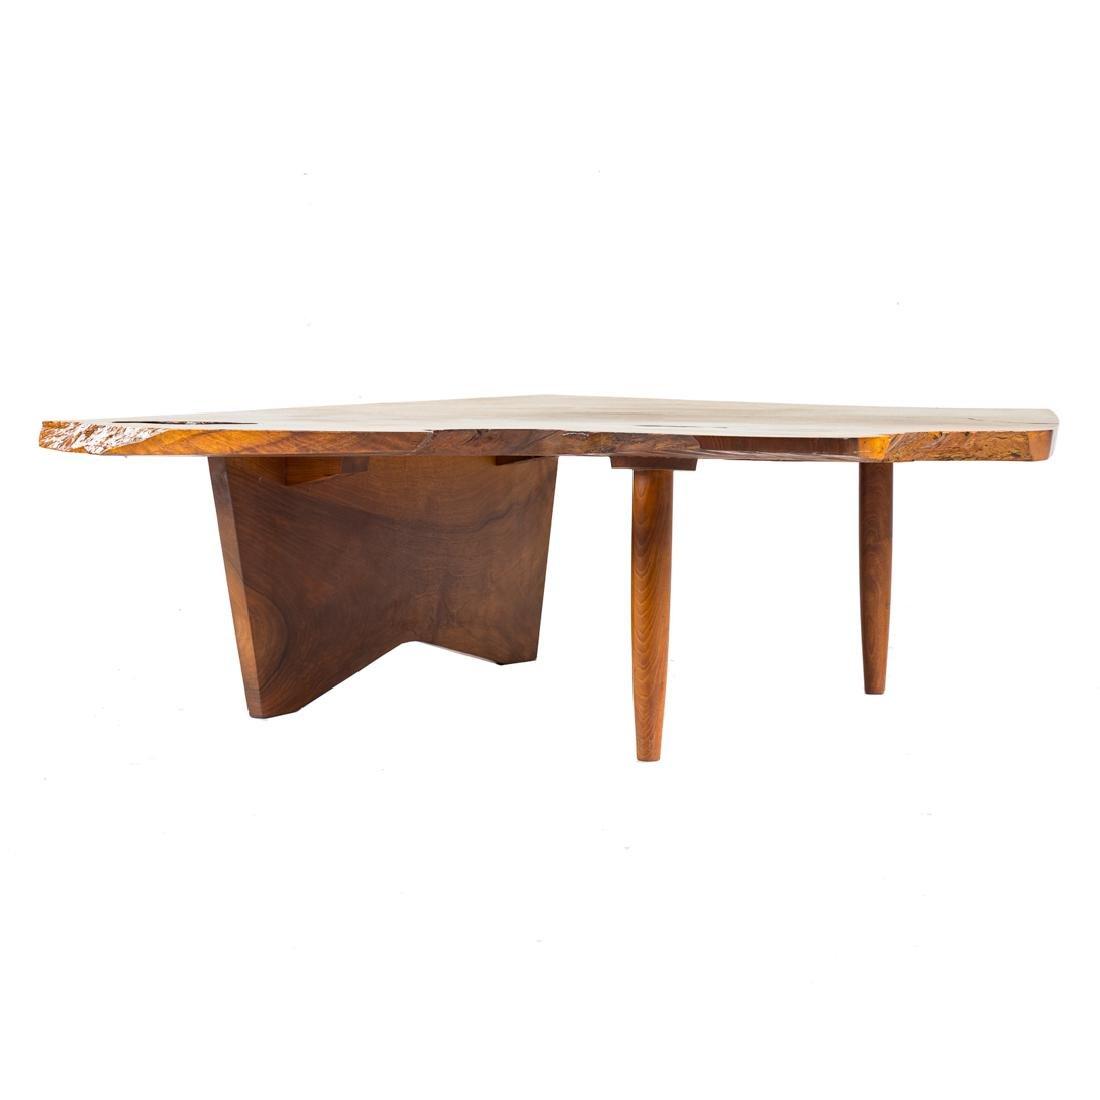 George Nakashima Conoid Coffee Table - 2